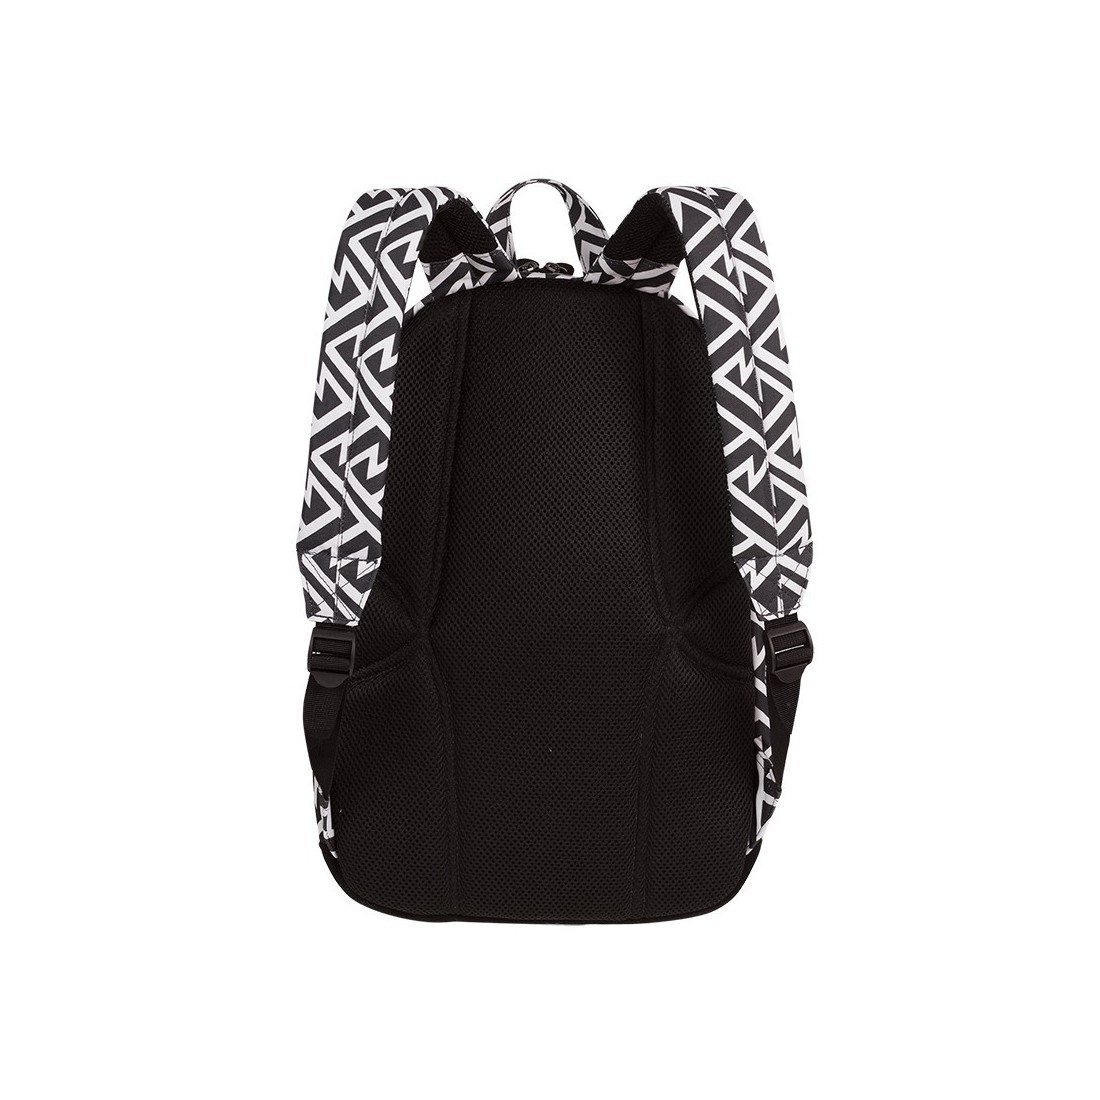 90e01aa0f7256 ... Plecak miejski CoolPack CP GRASP BLACK & WHITE TRIBAL geometryczne białe  wzory czarne tło - A124